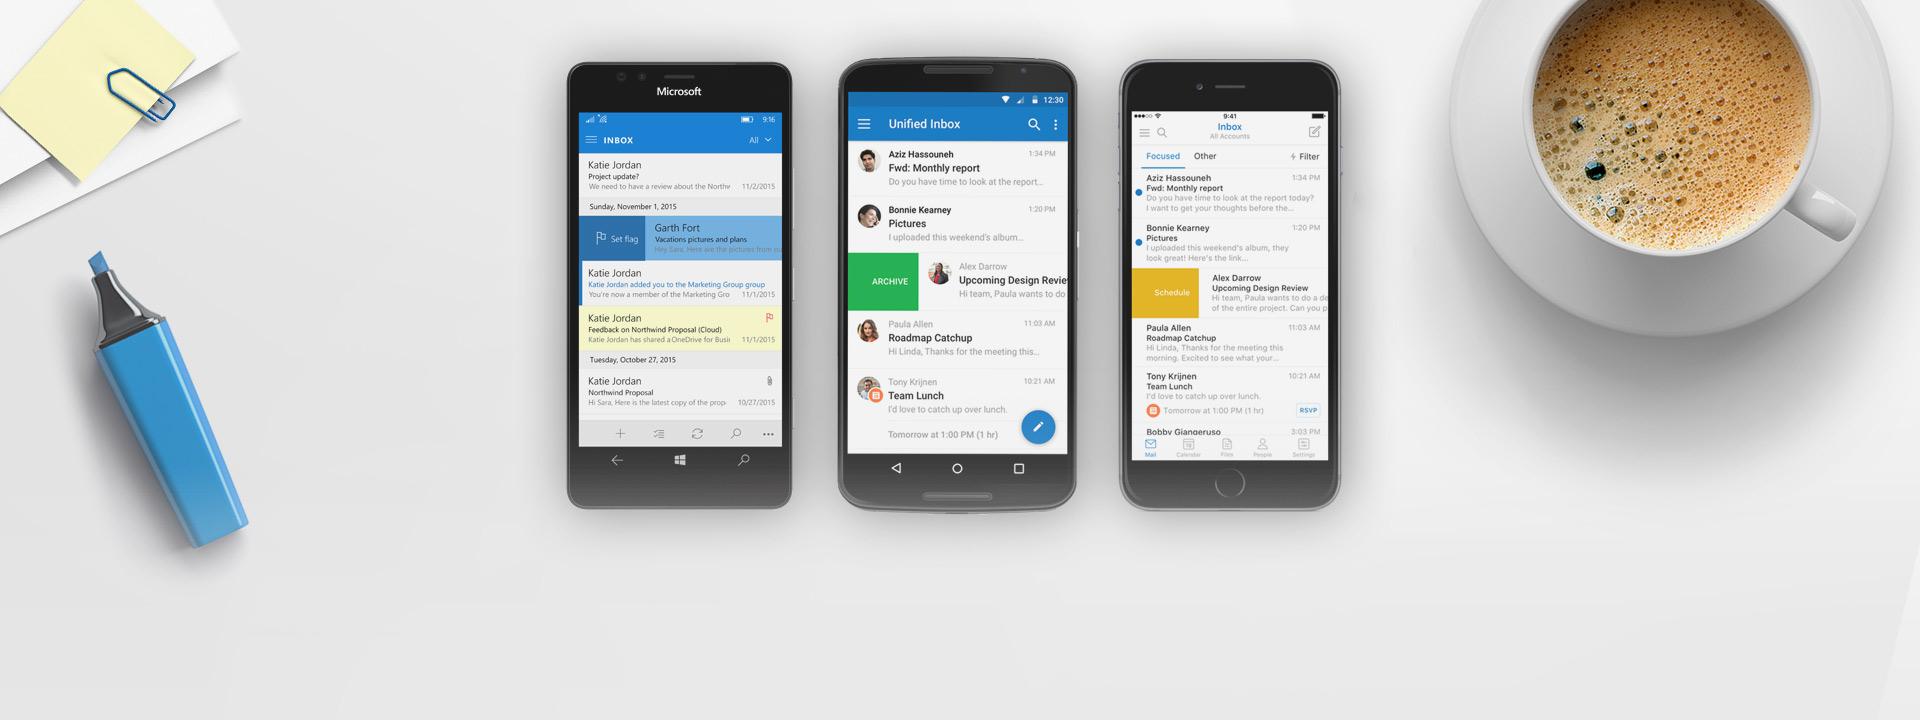 Telefon Windows Phone, iPhone in telefon s sistemom Android s programom Outlook na zaslonu